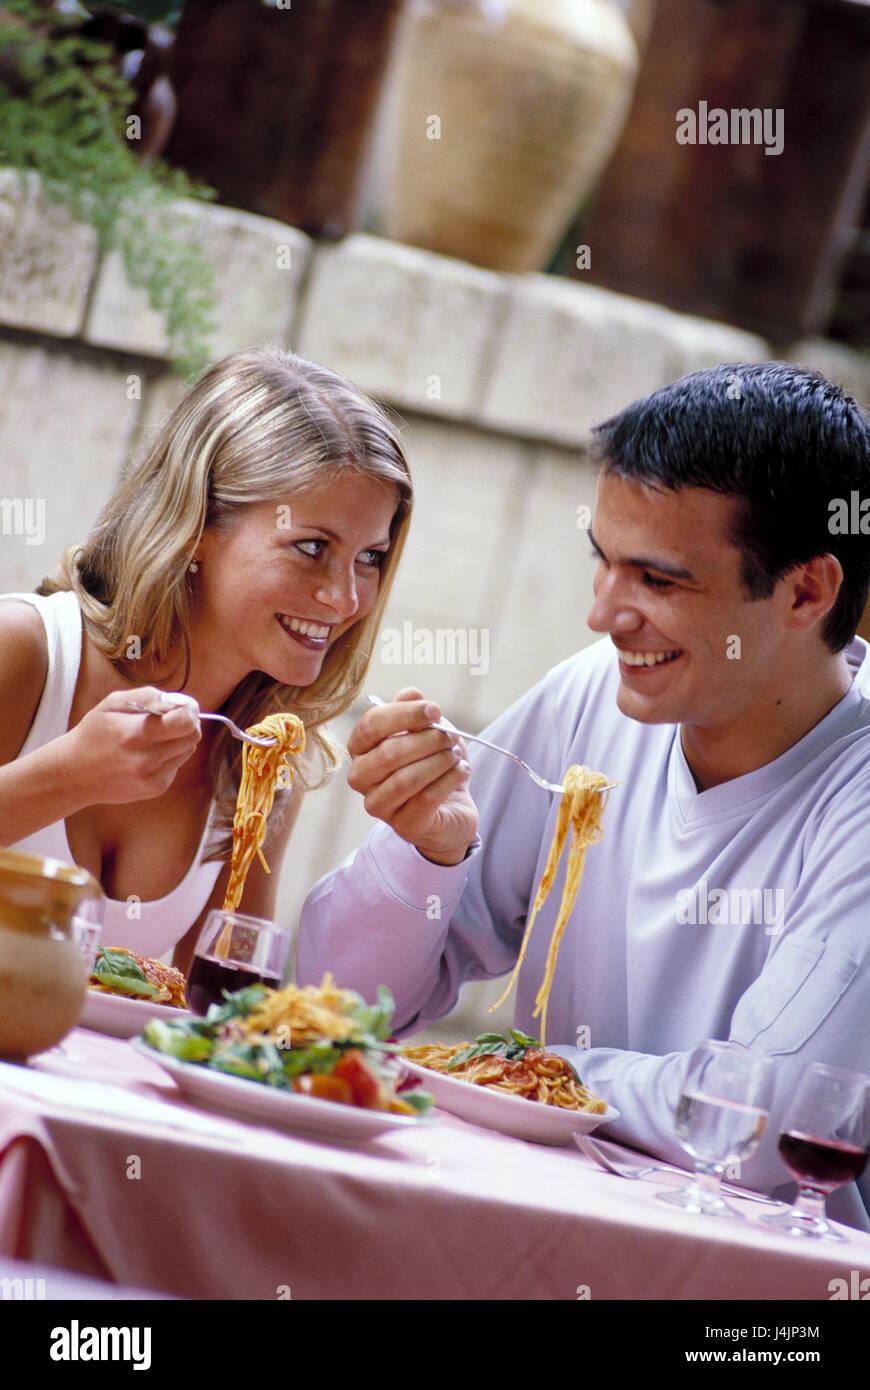 Restaurant, paar, Blickkontakt, Spaghetti, Essen, Salatteller ...